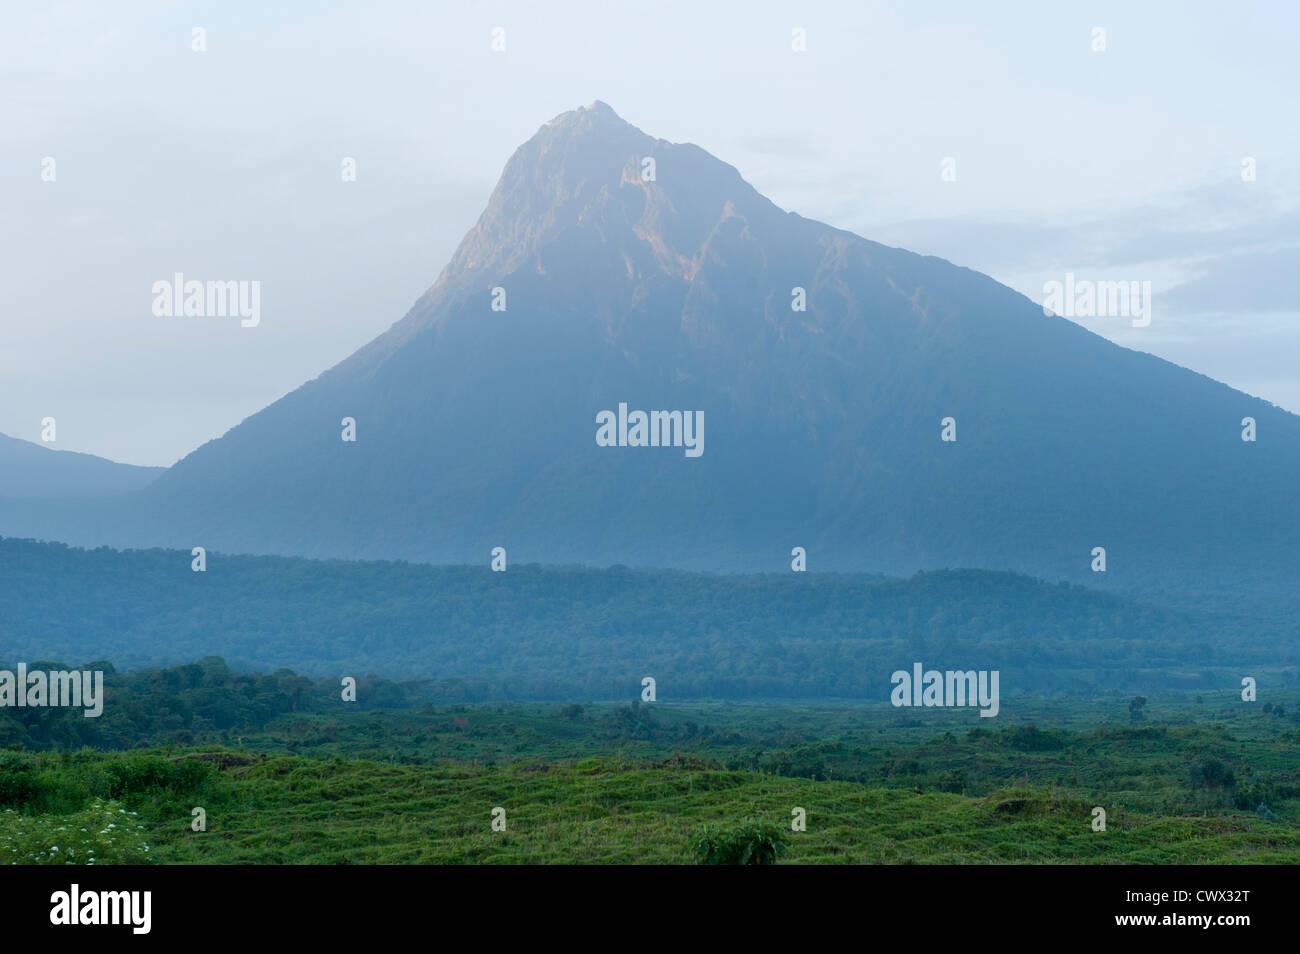 Volcano Mount Mikeno, Virunga National Park, DR Congo - Stock Image